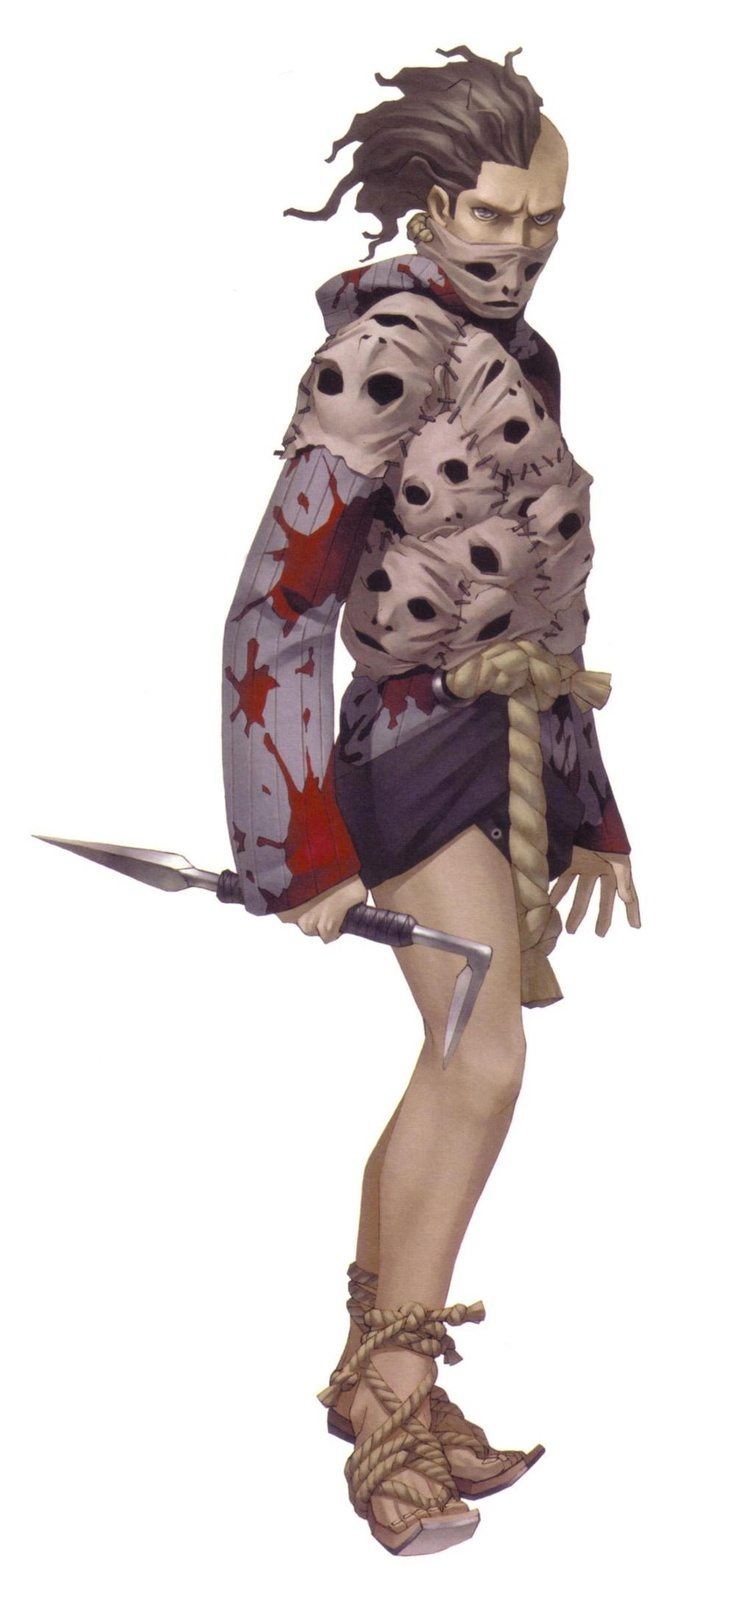 Shin Megami Tensei III: Nocturne Character Images - Megami Tensei Wiki: a Demonic Compendium of your True Self